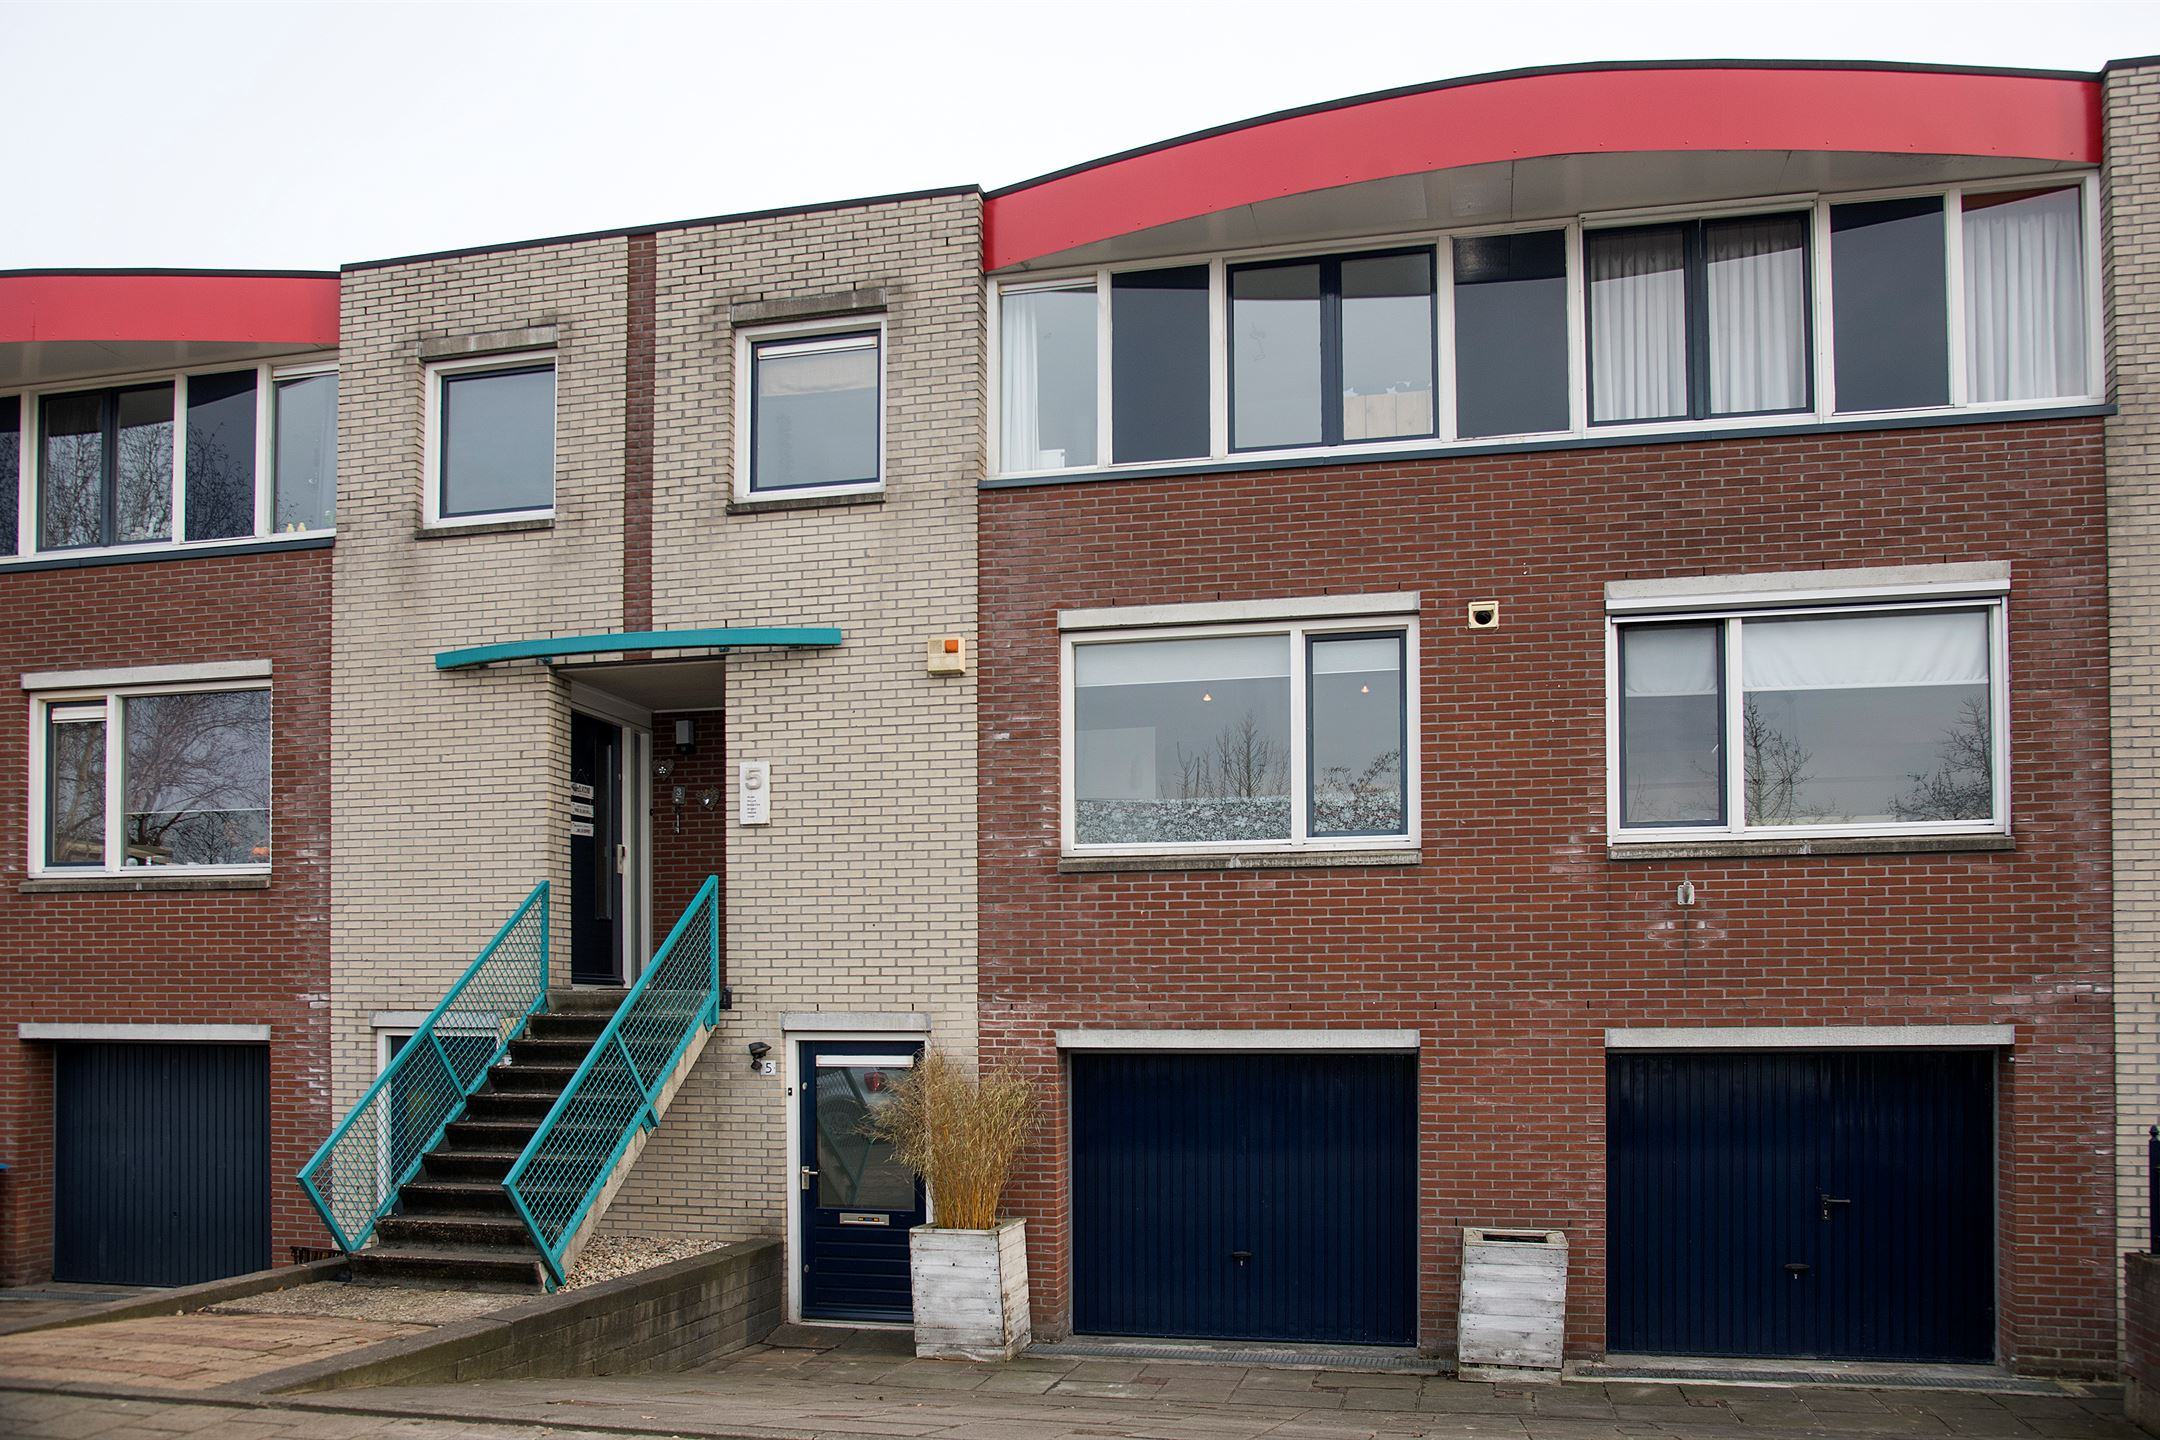 Verkocht theresastraat 5 7543 rd enschede funda for Funda woonboerderij twente